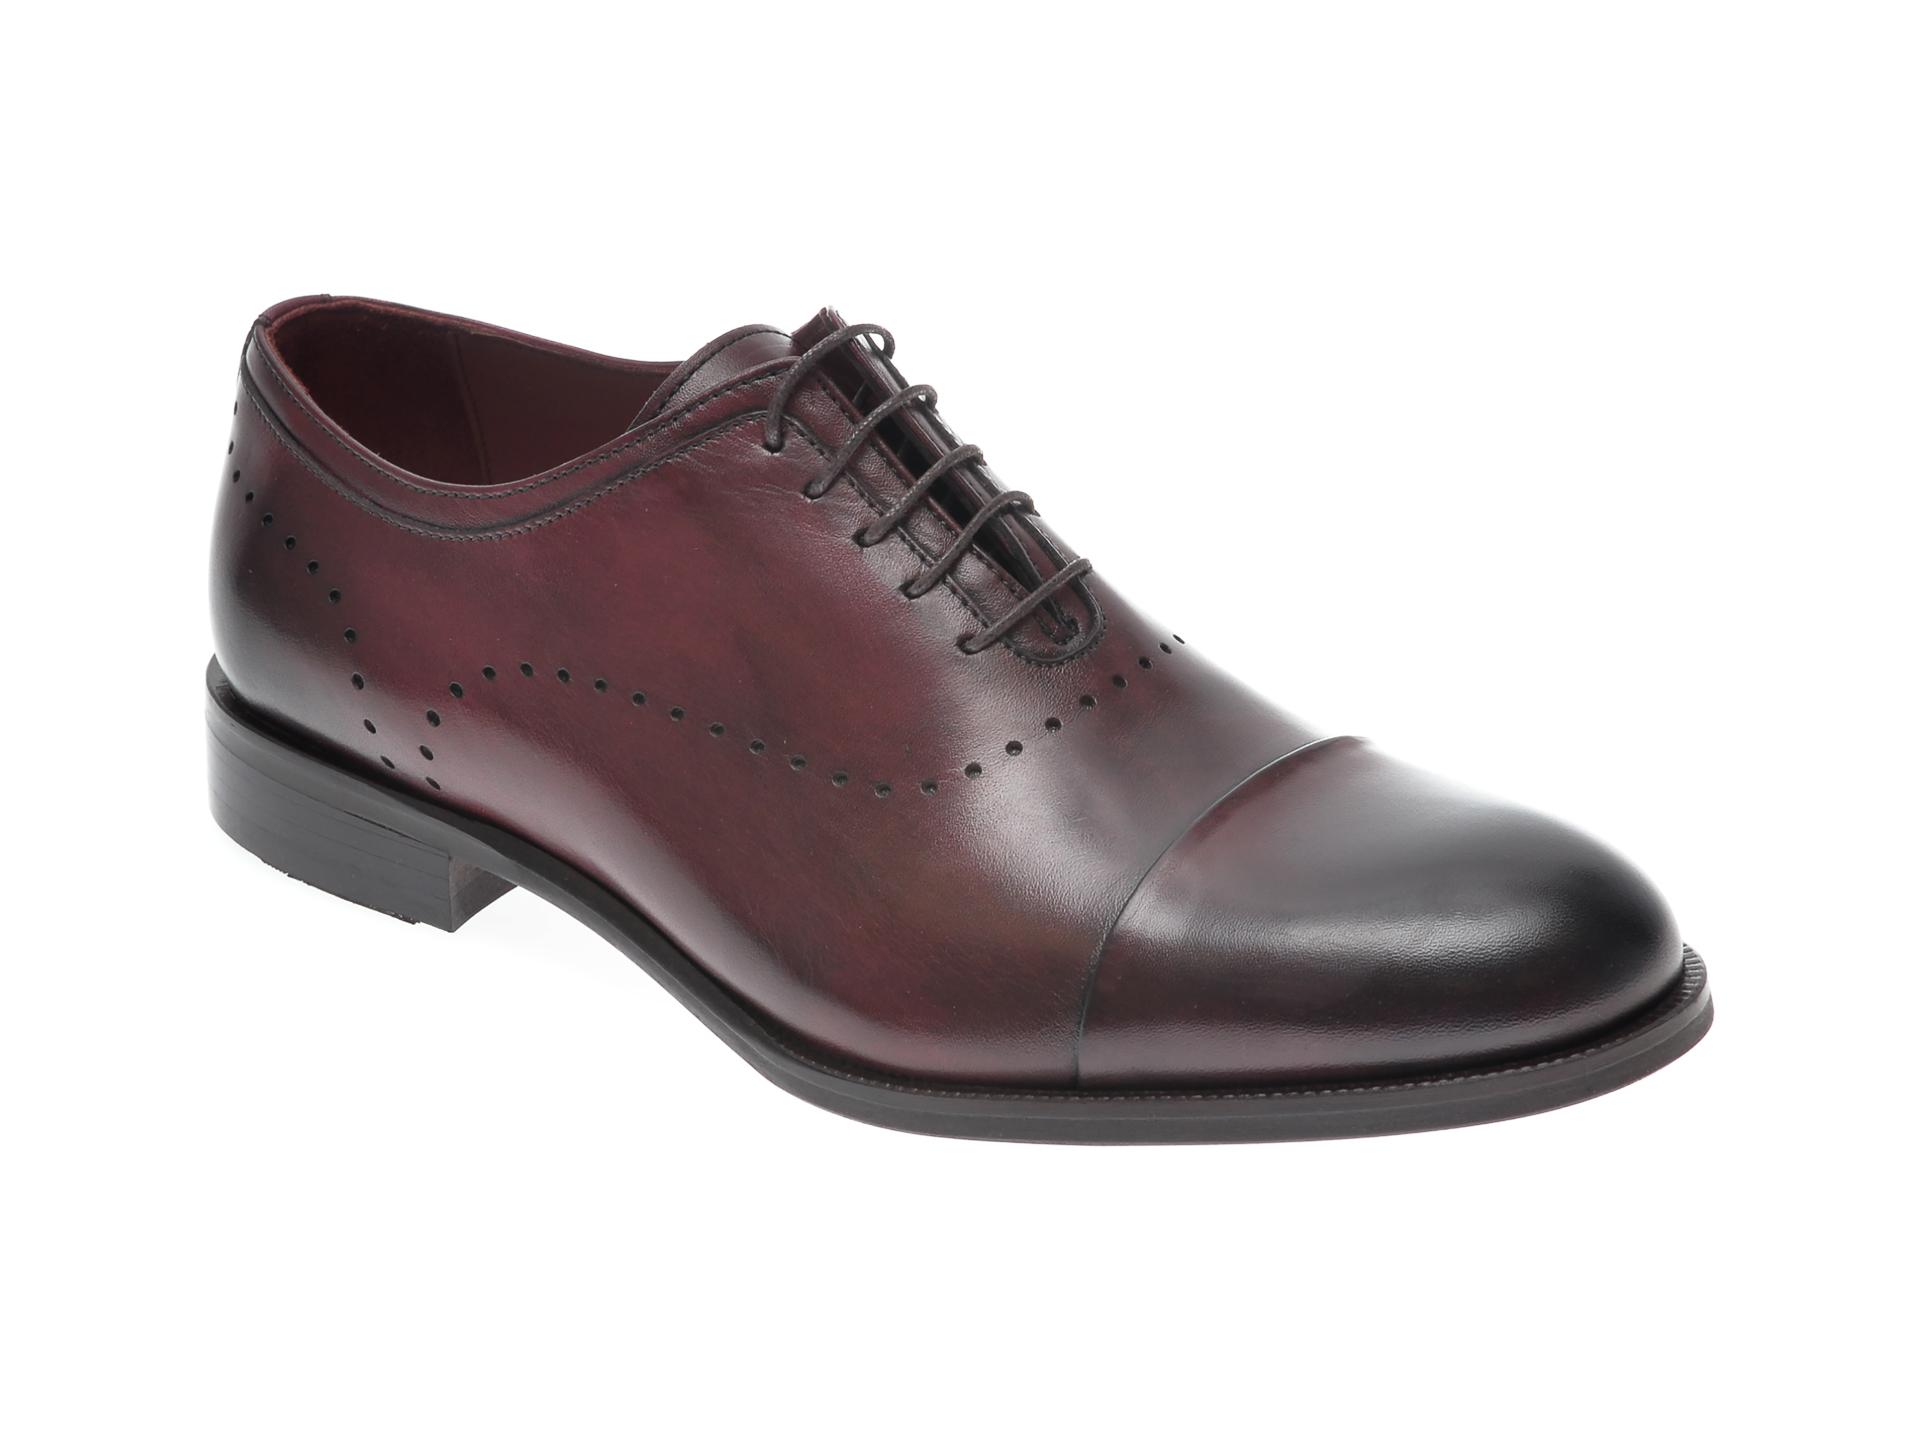 Pantofi OTTER visinii, 7844, din piele naturala imagine